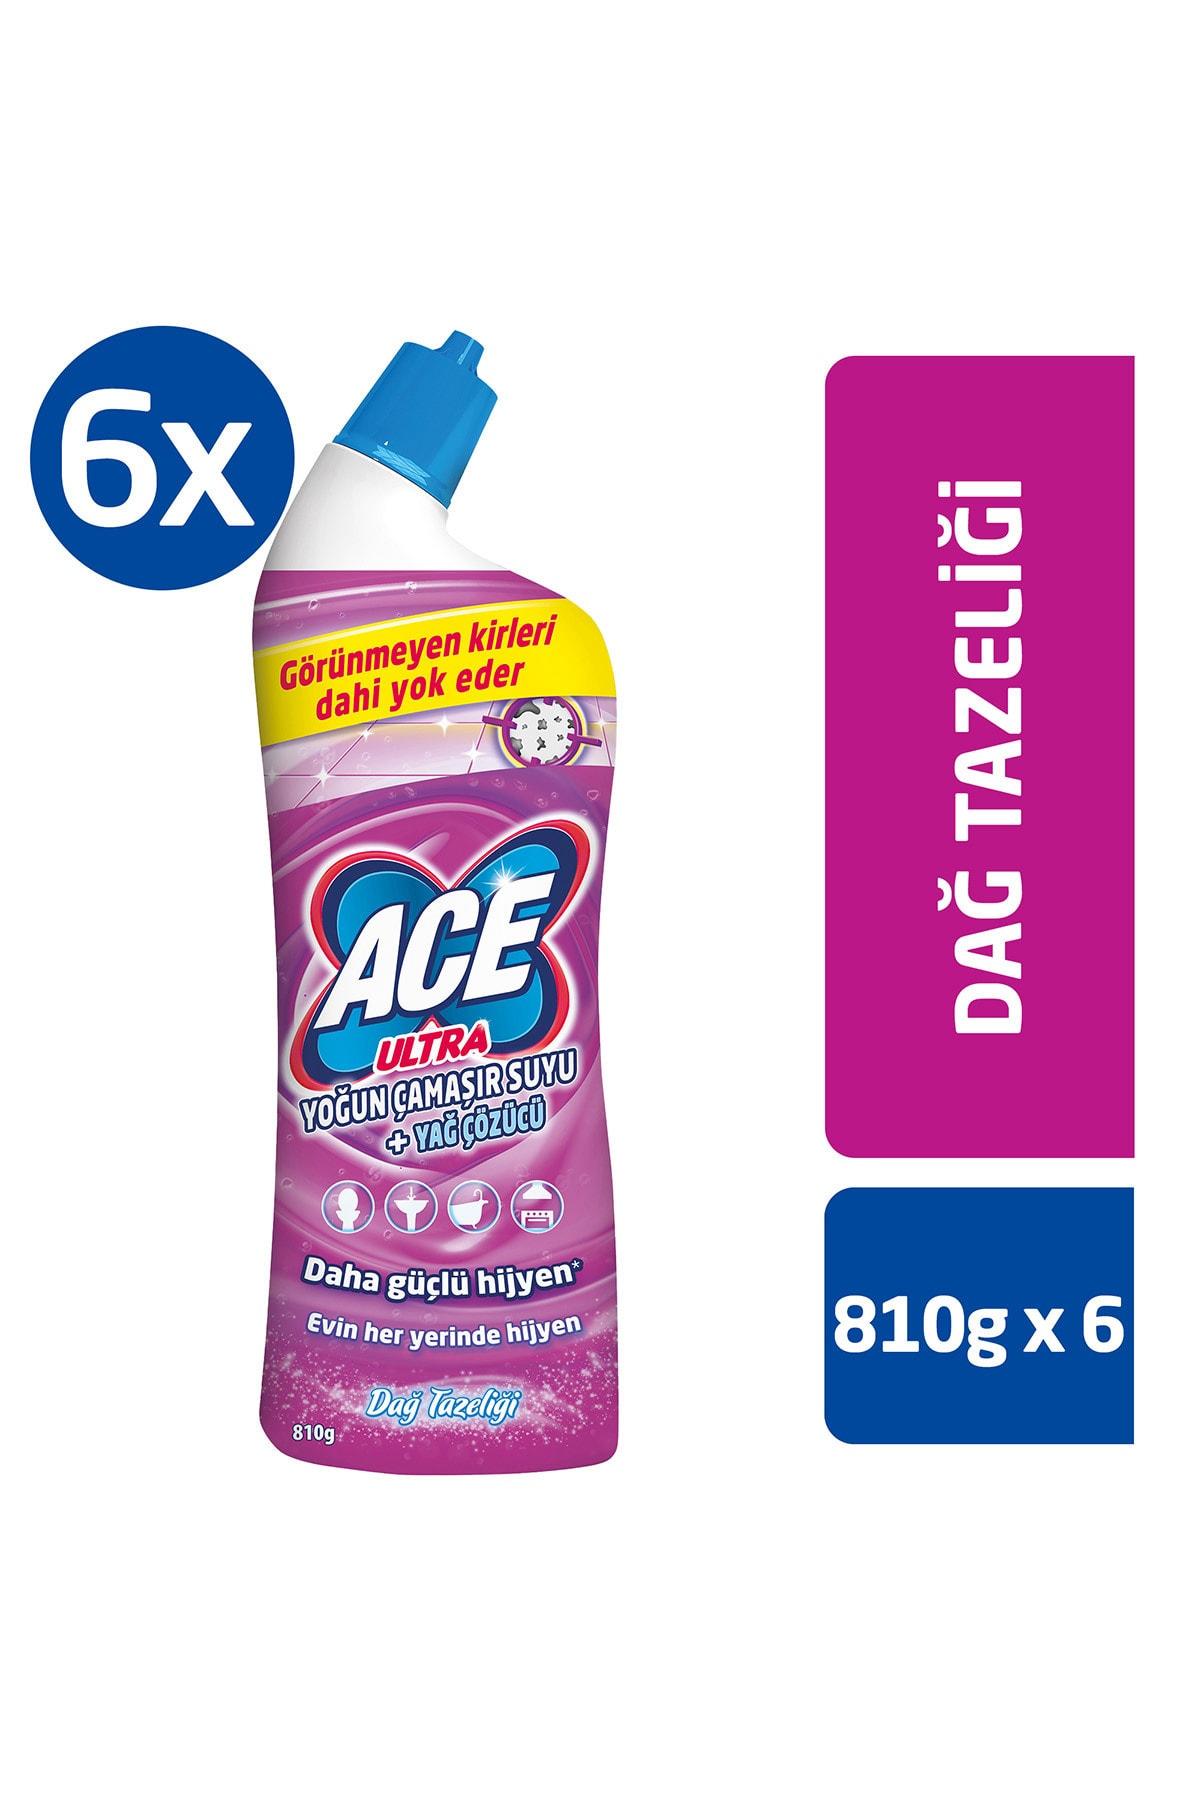 ACE Ultra Power Jel Kıvamlı Çamaşır Suyu Dağ Tazeliği 810g X 6 Adet 1